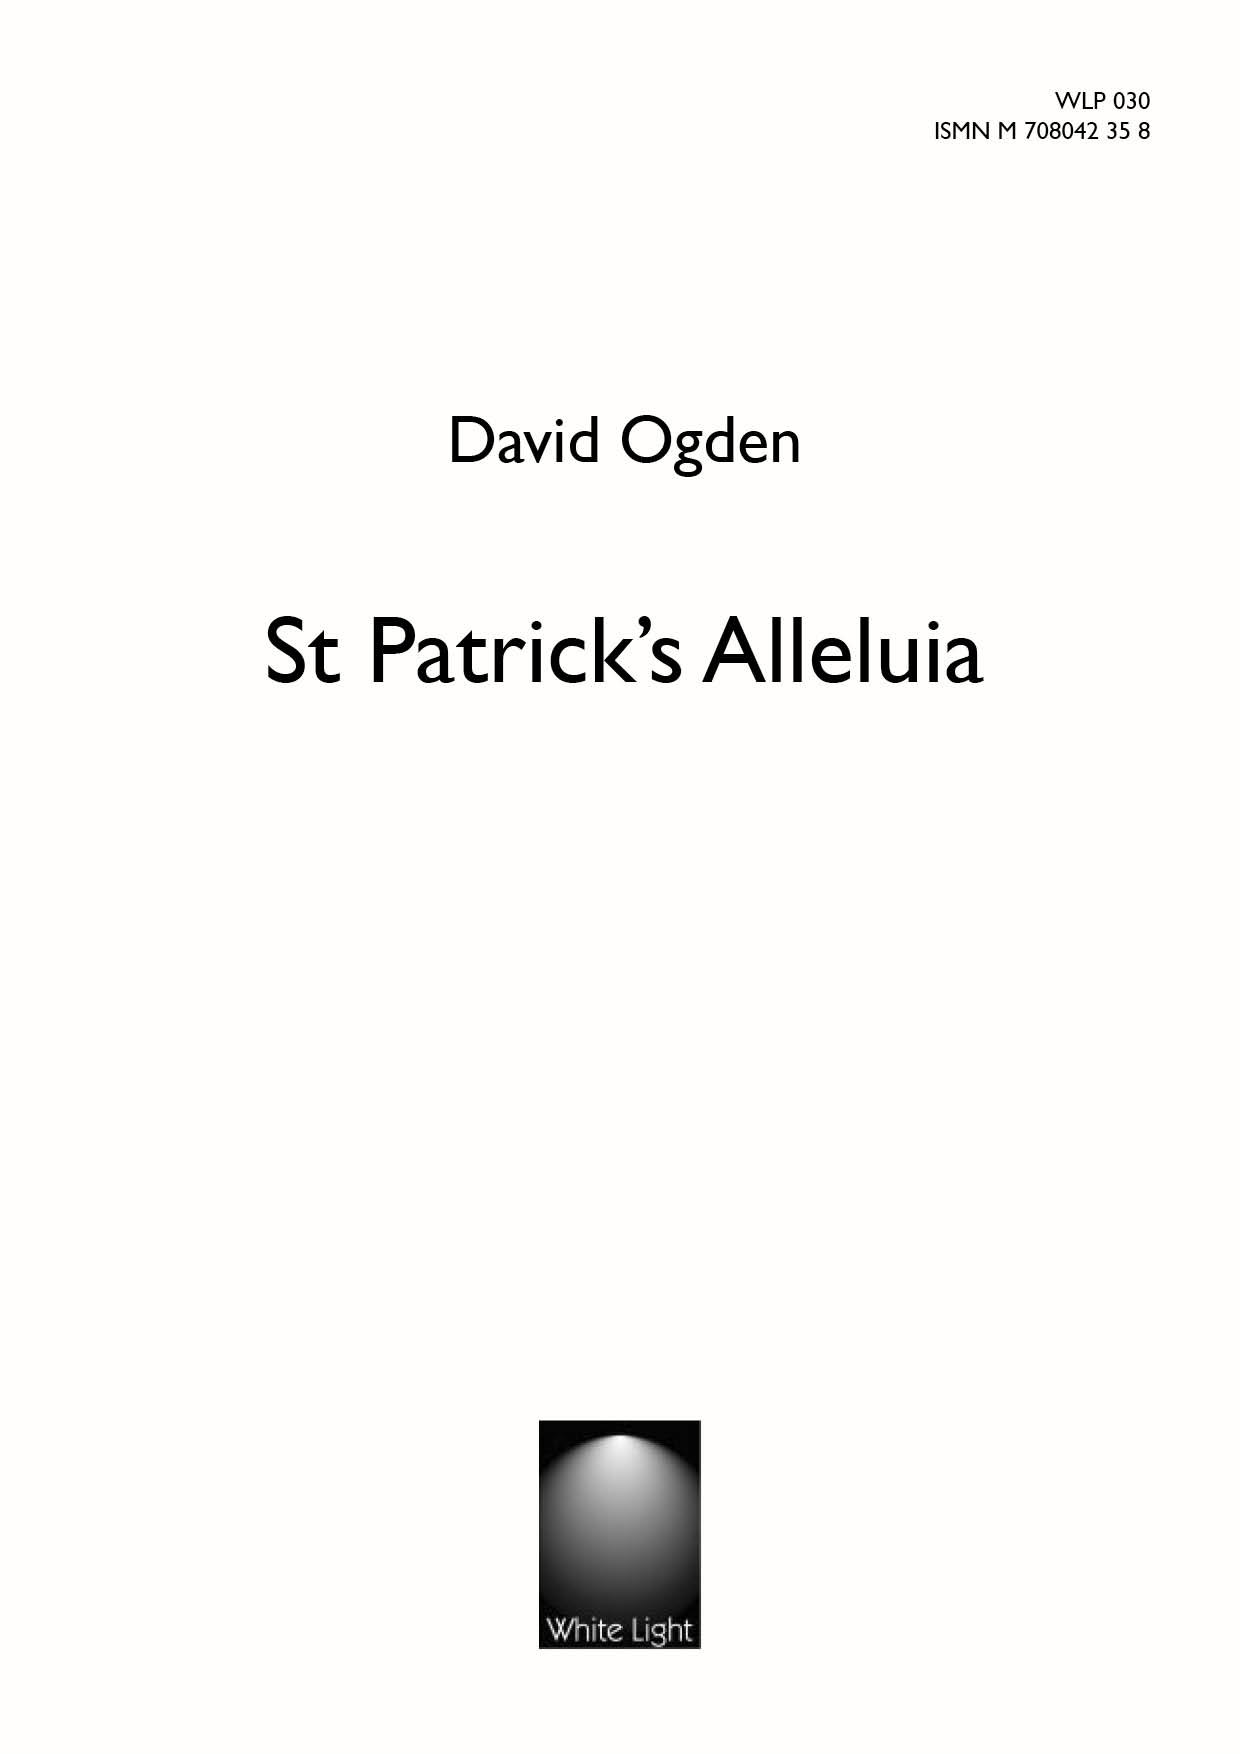 St Patrick's Allelluia